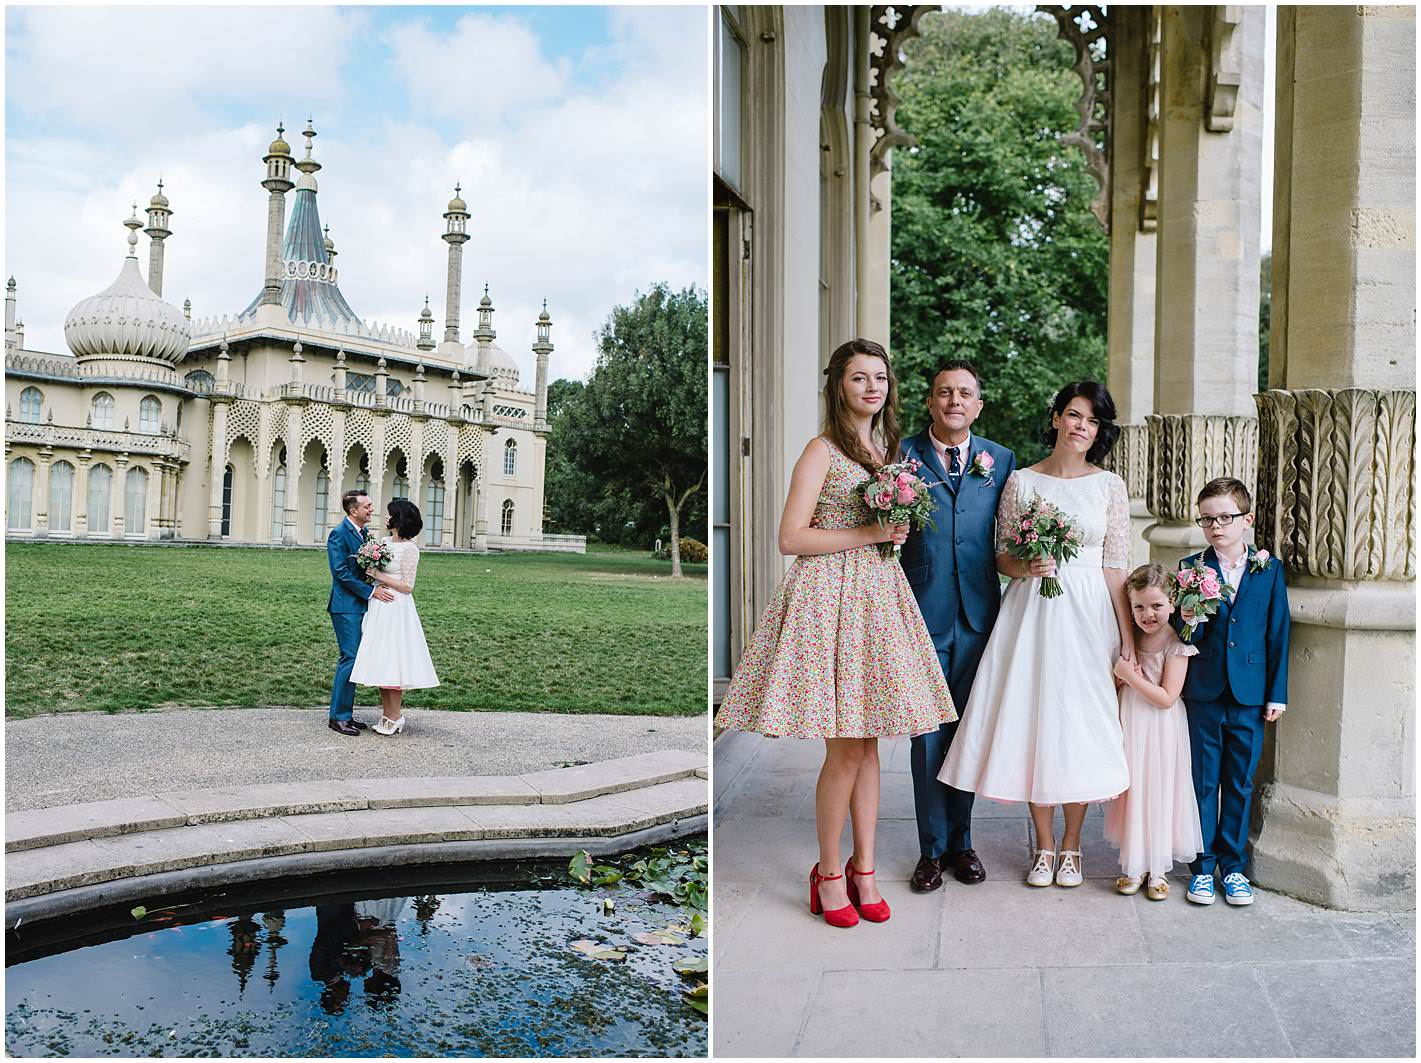 royal-pavilion-wedding-brighton389